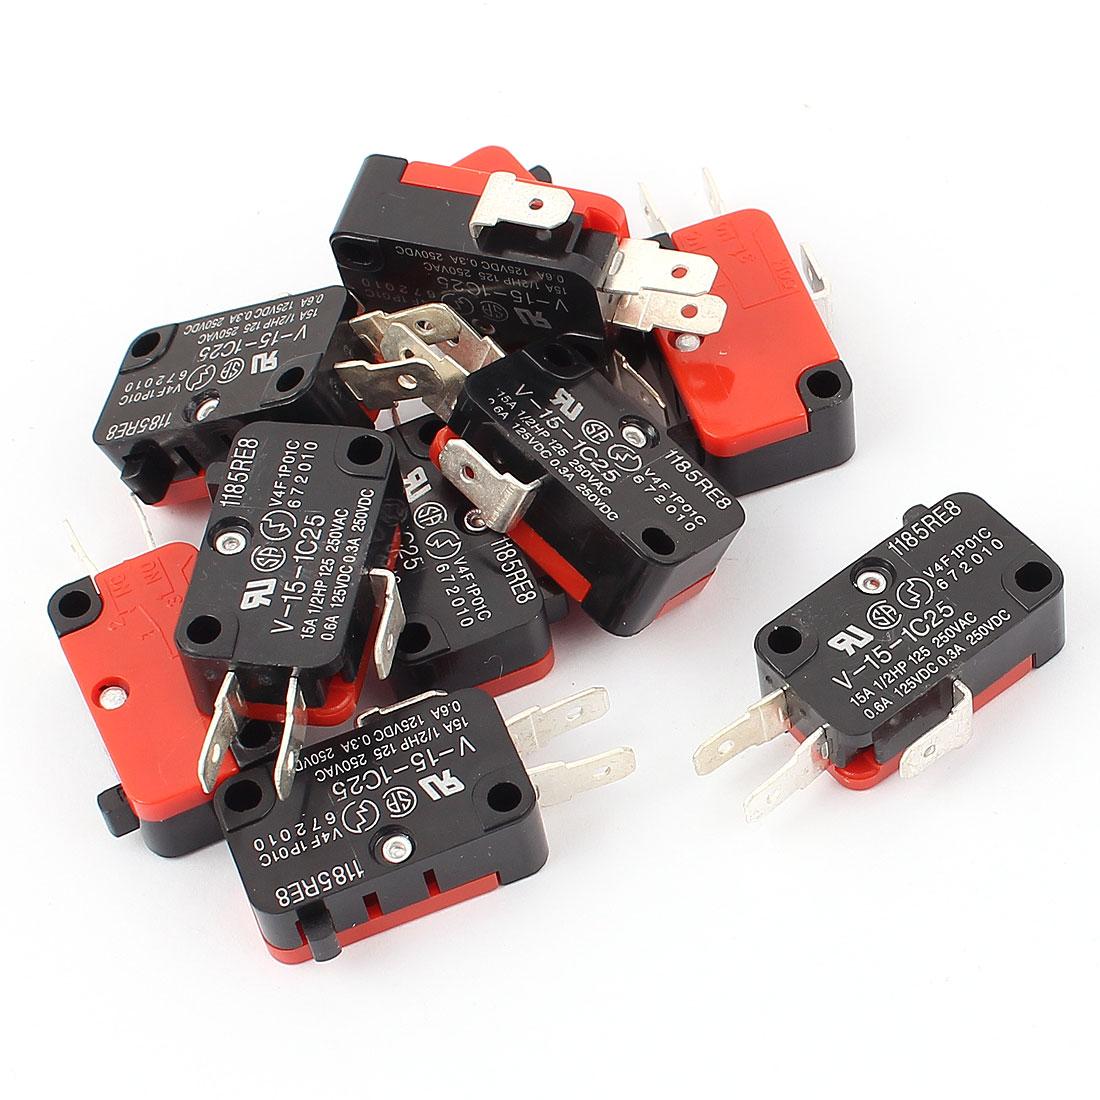 V-15-1C25 AC 250V 15A 1NO 1NC SPDT Momentary Micro Limit Switch Button 10Pcs